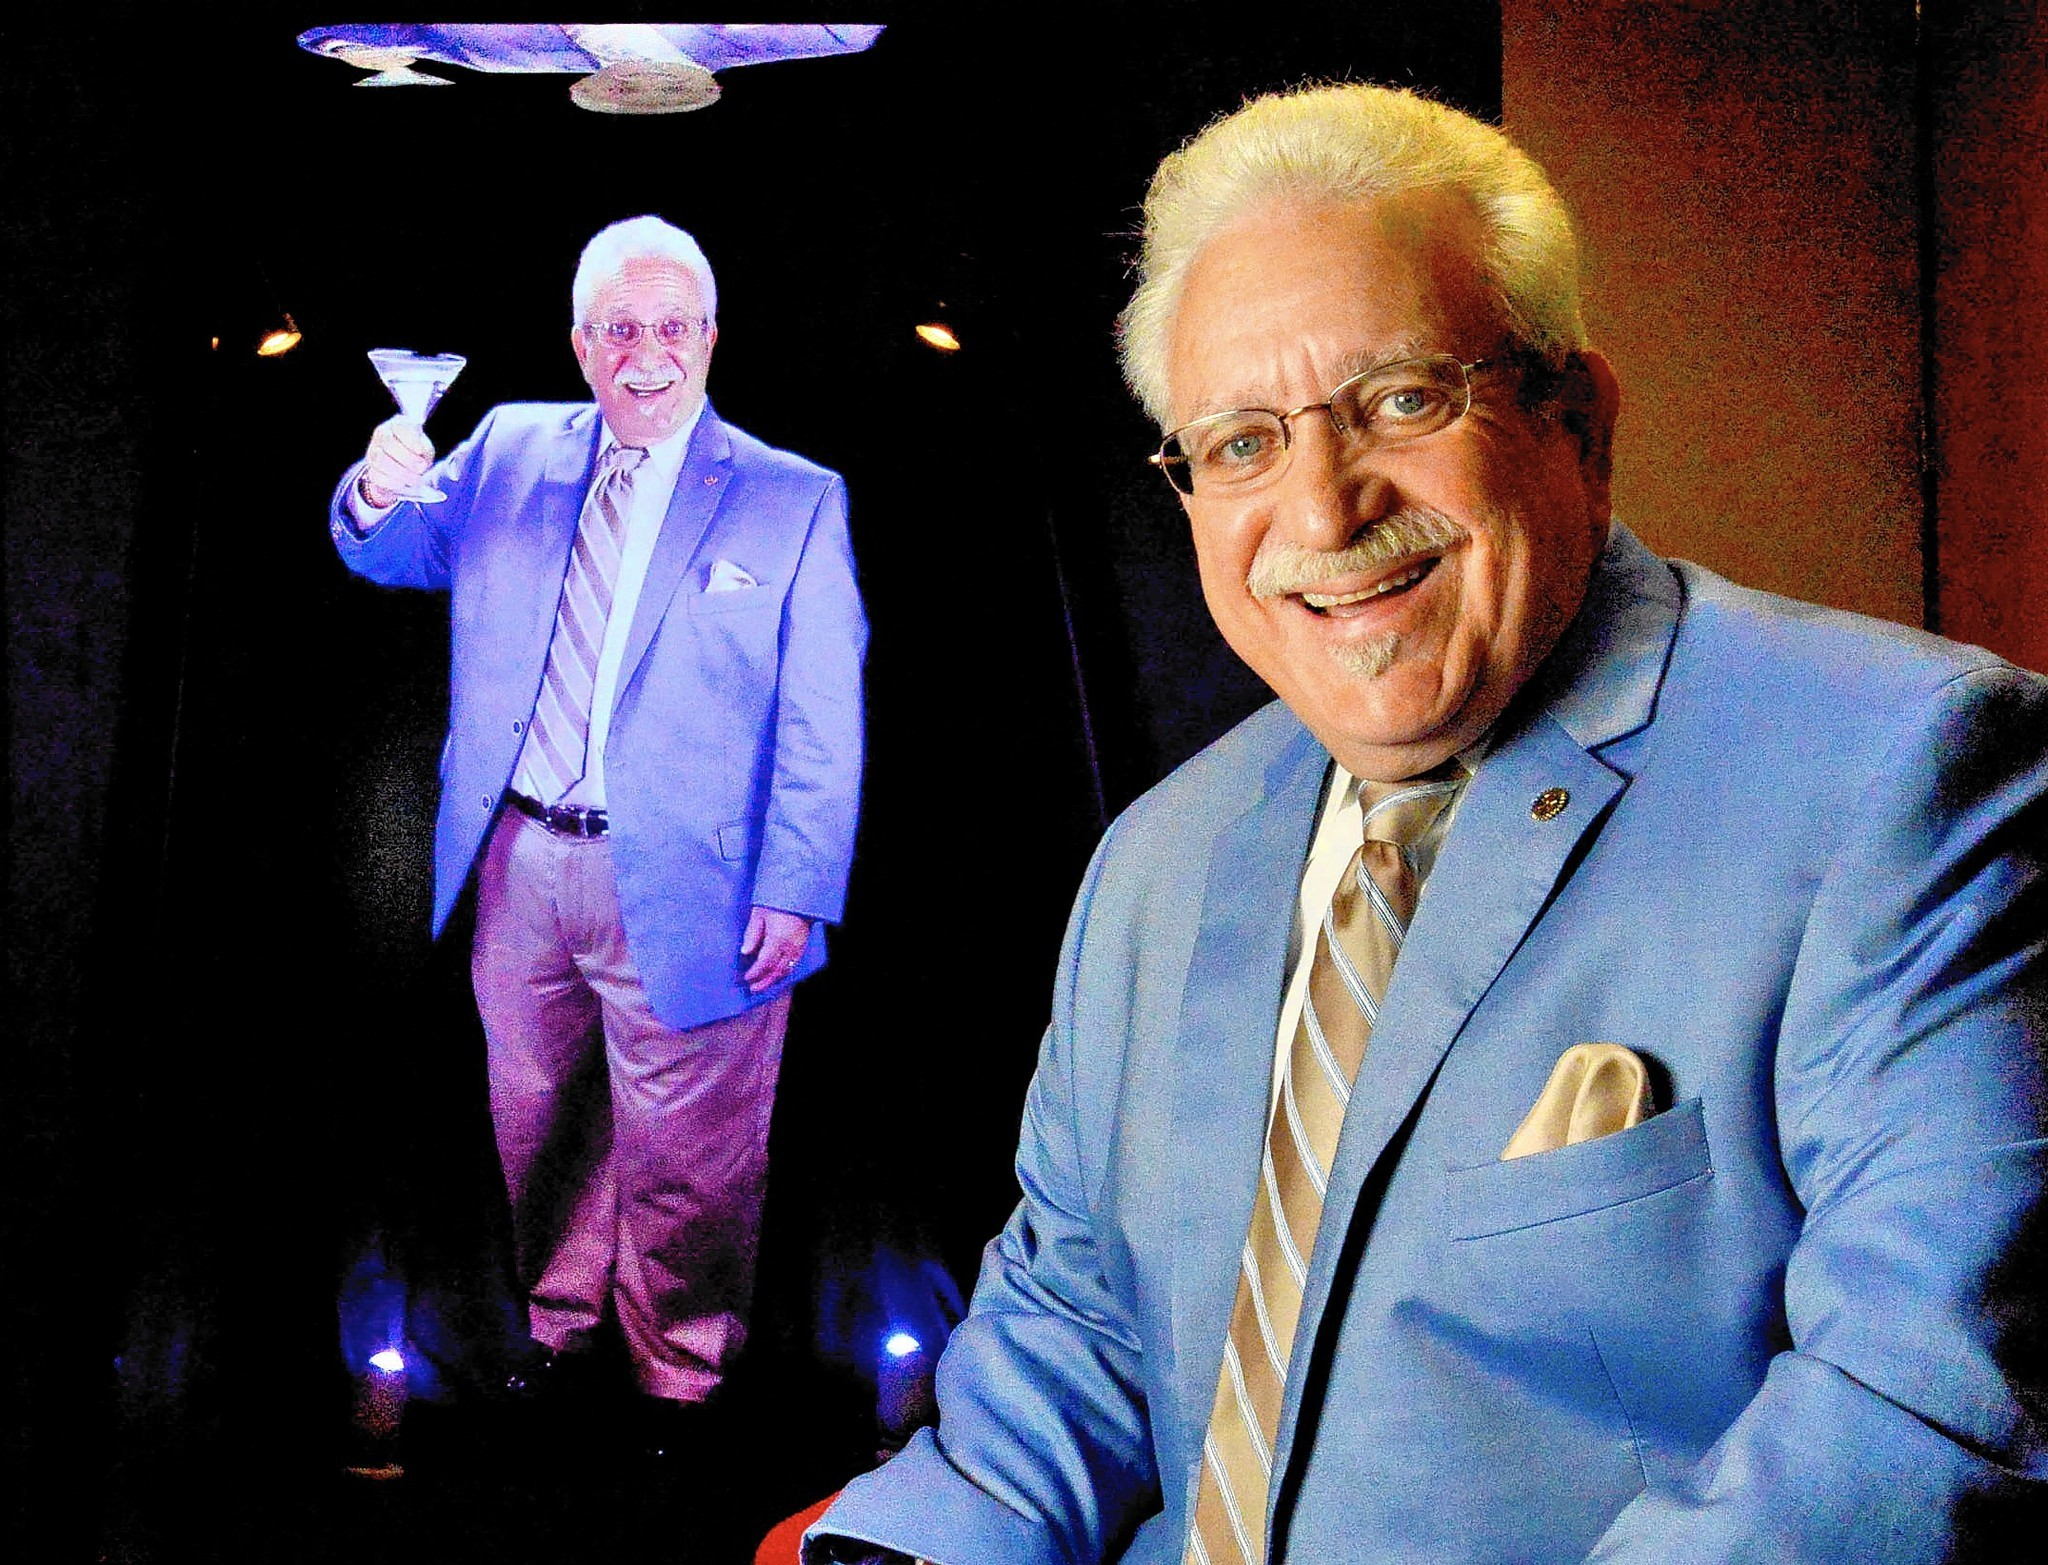 Carl Minardo, CEO of AIM Holographics Inc. with his funeral hologram